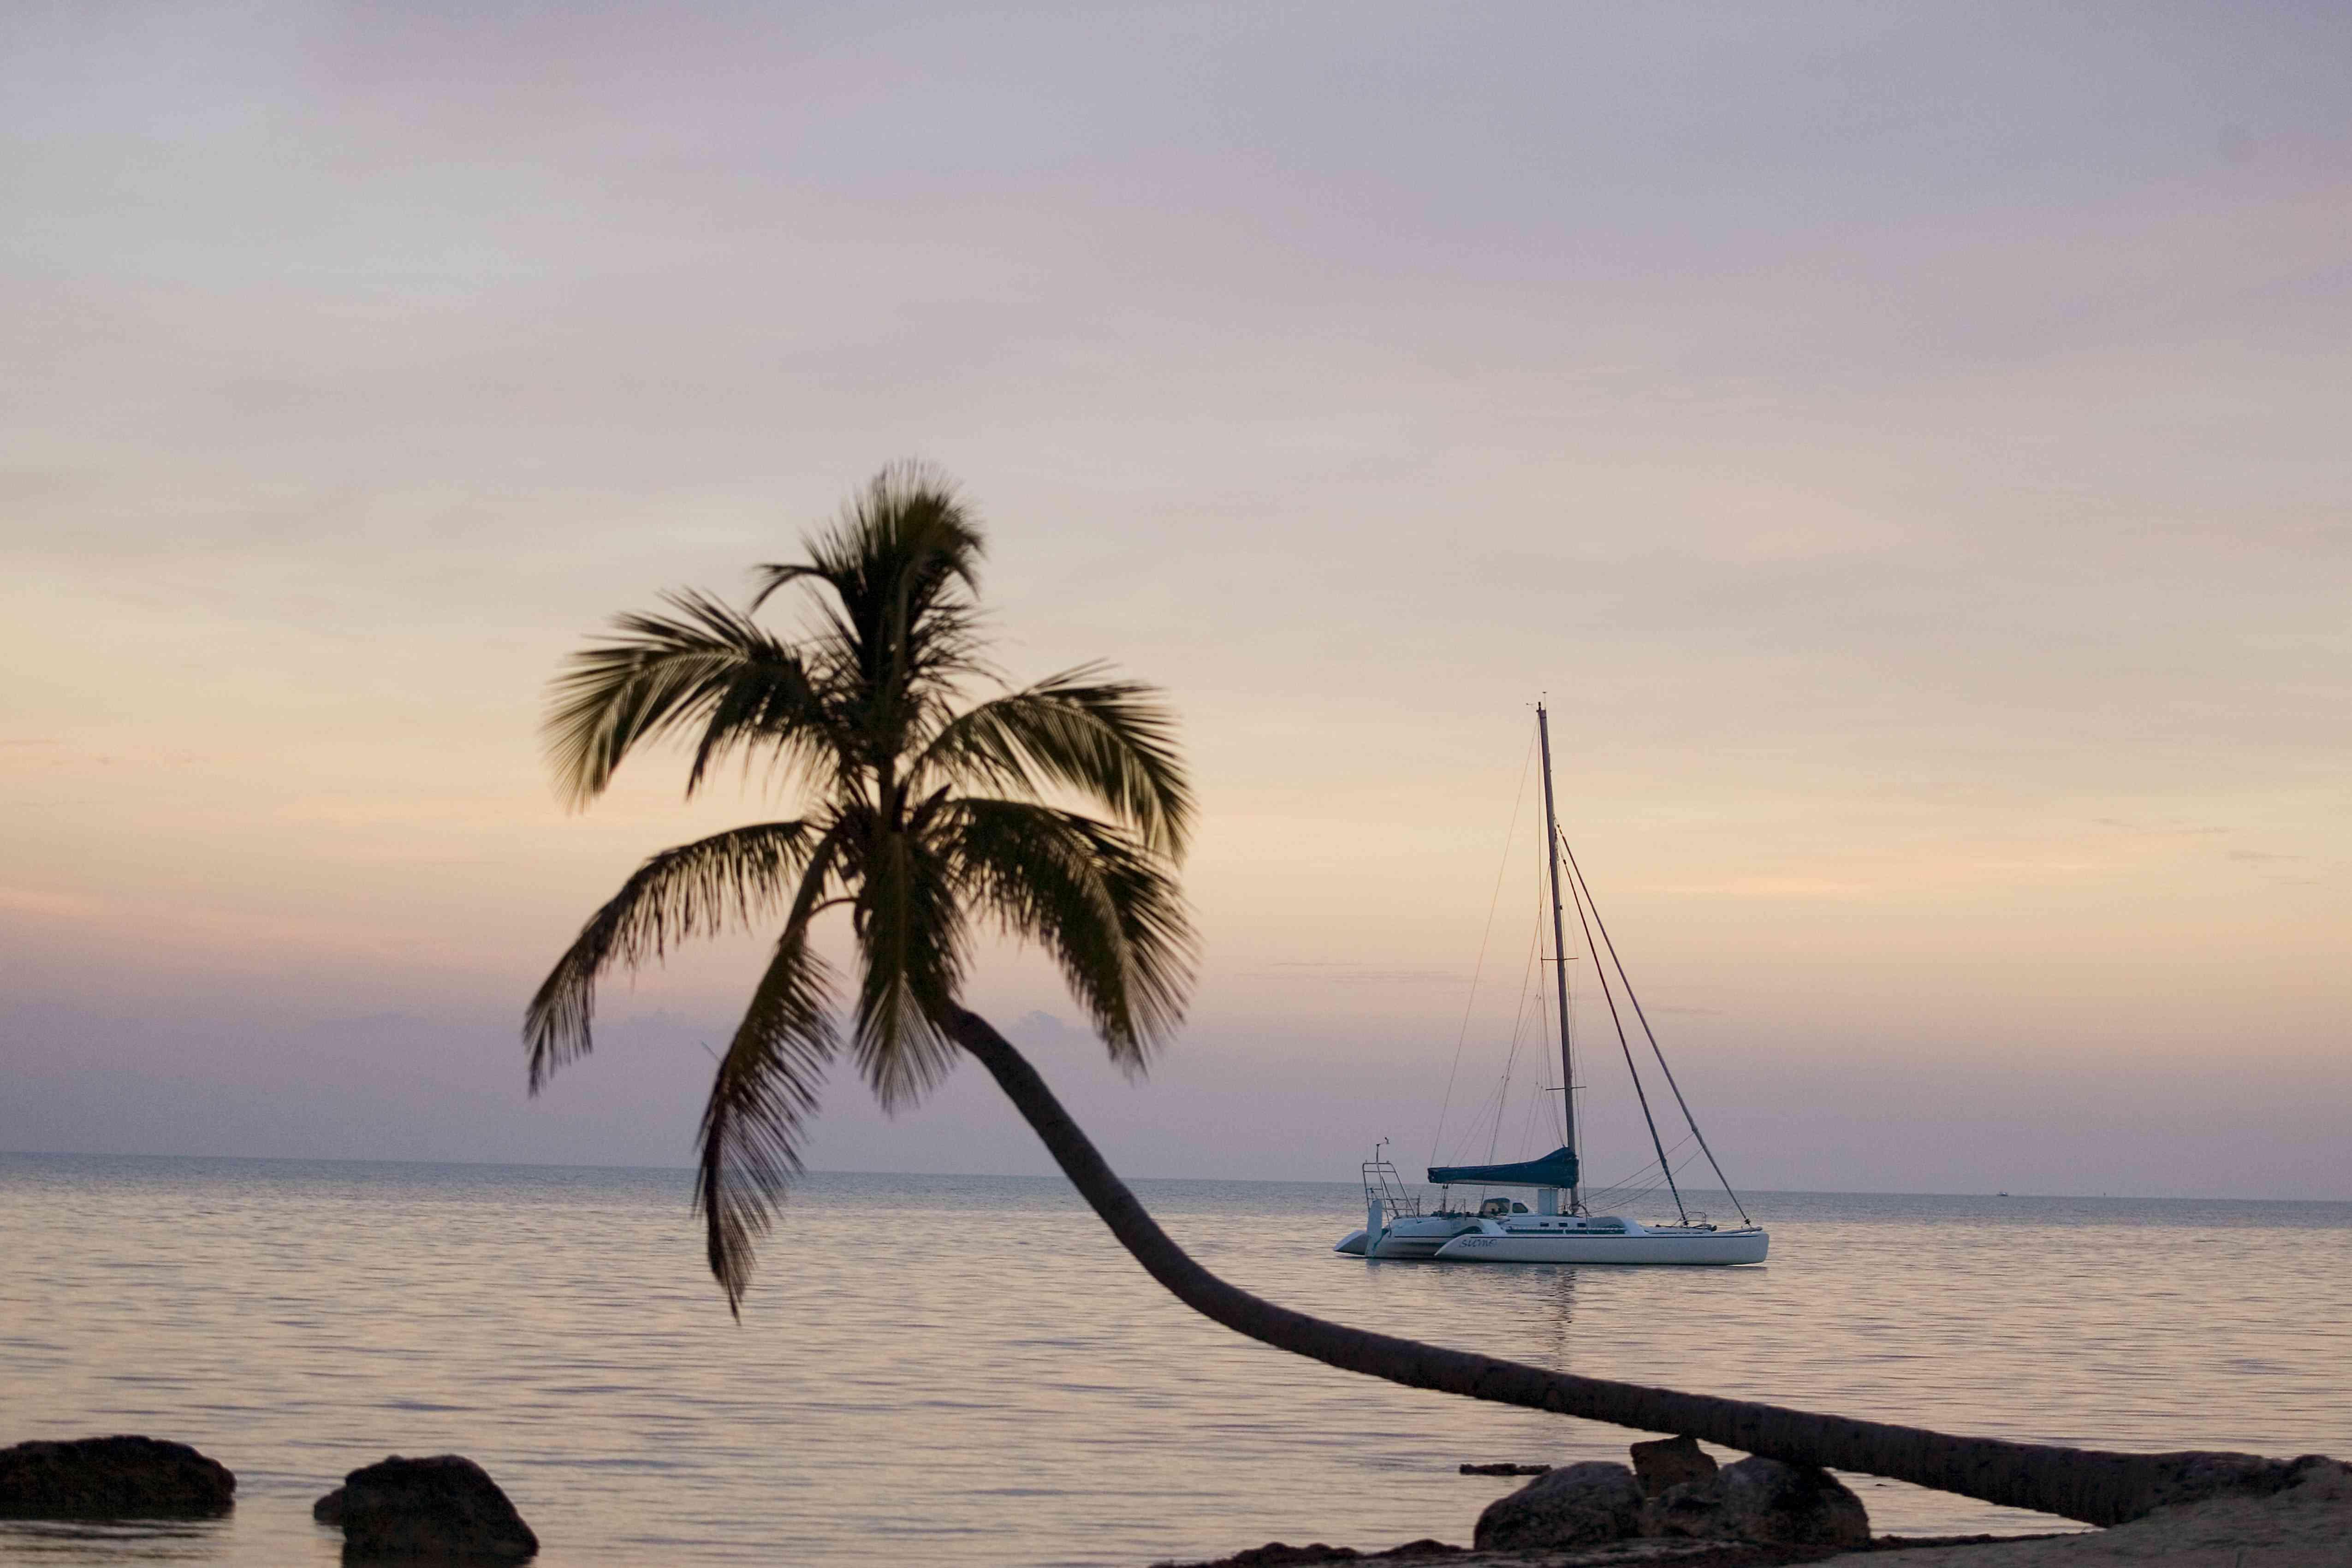 Palm tree in silhouette and sailboat behind it, Florida, Islamorada